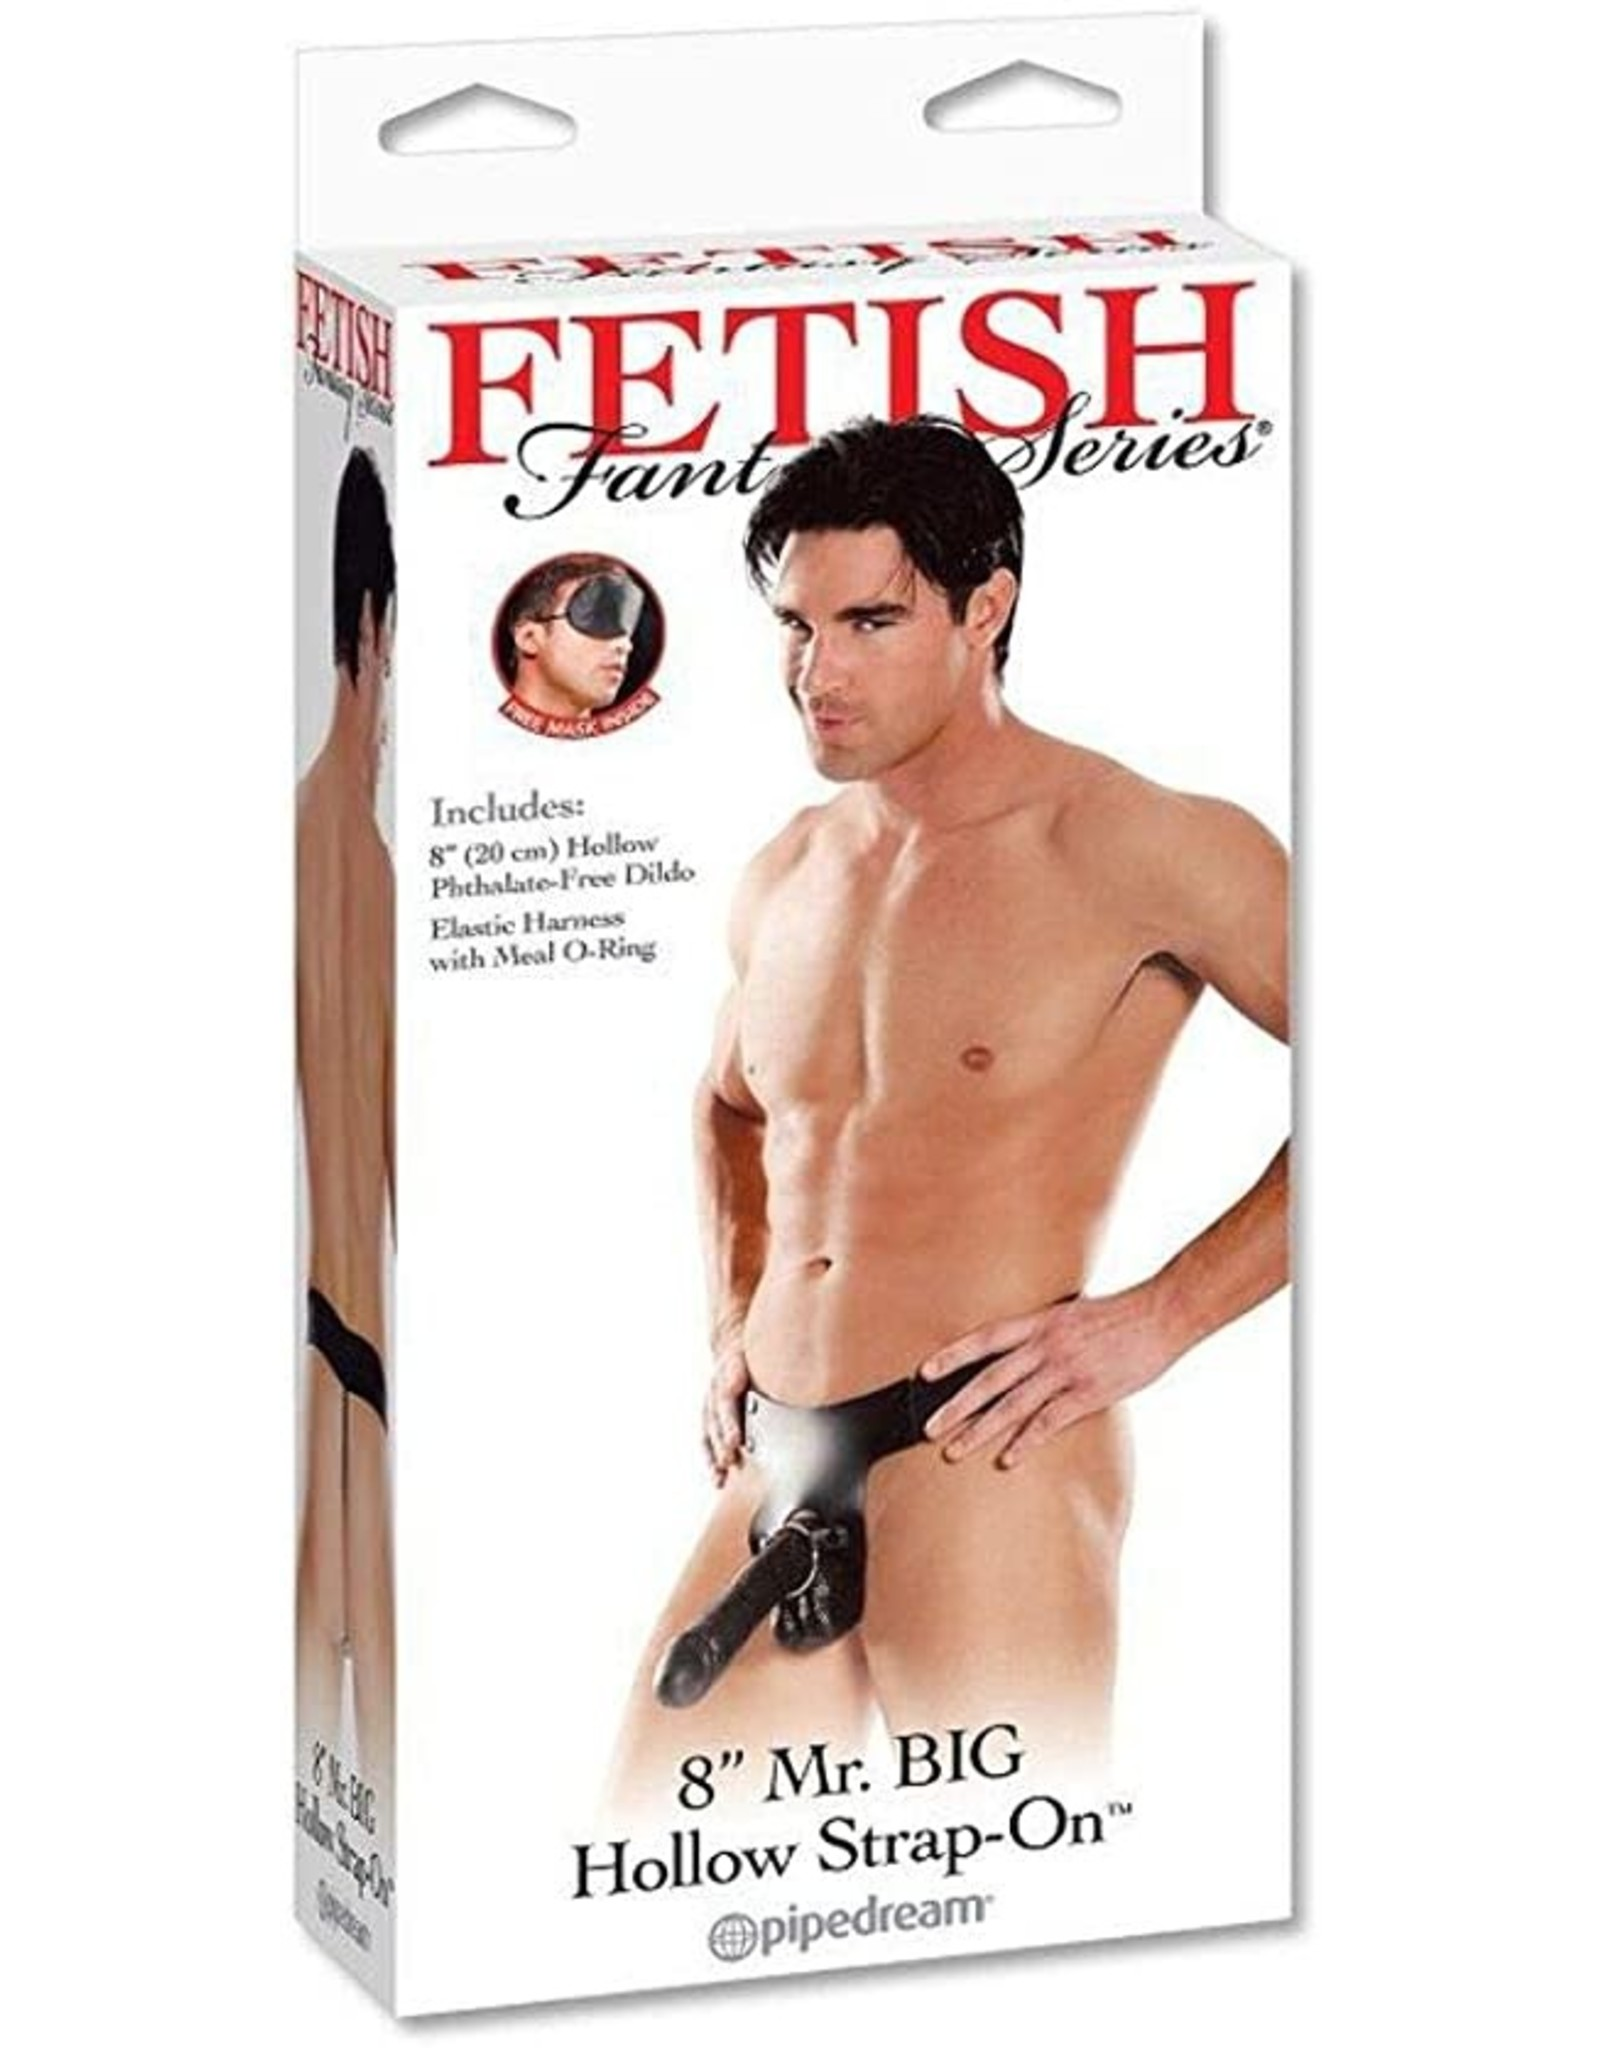 "FETISH FANTASY FETISH FANTASY - MR.BIG HOLLOW 8"" STRAP-ON"